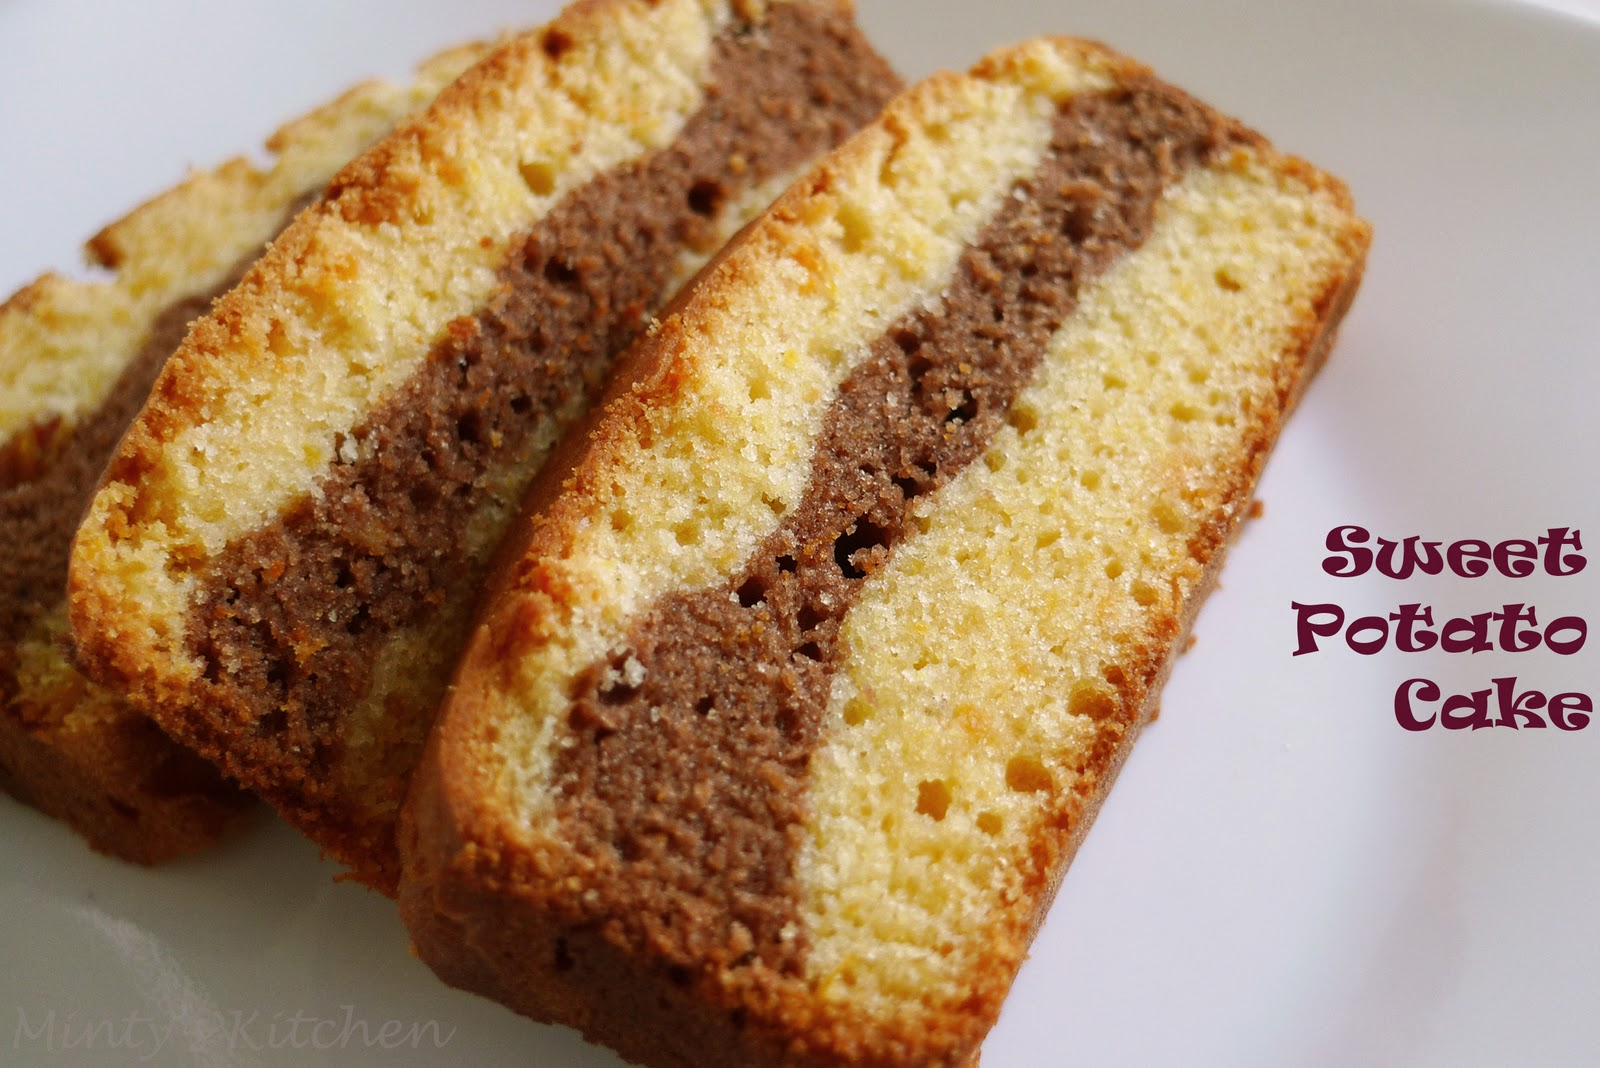 Minty's Kitchen: Sweet Potato Cake